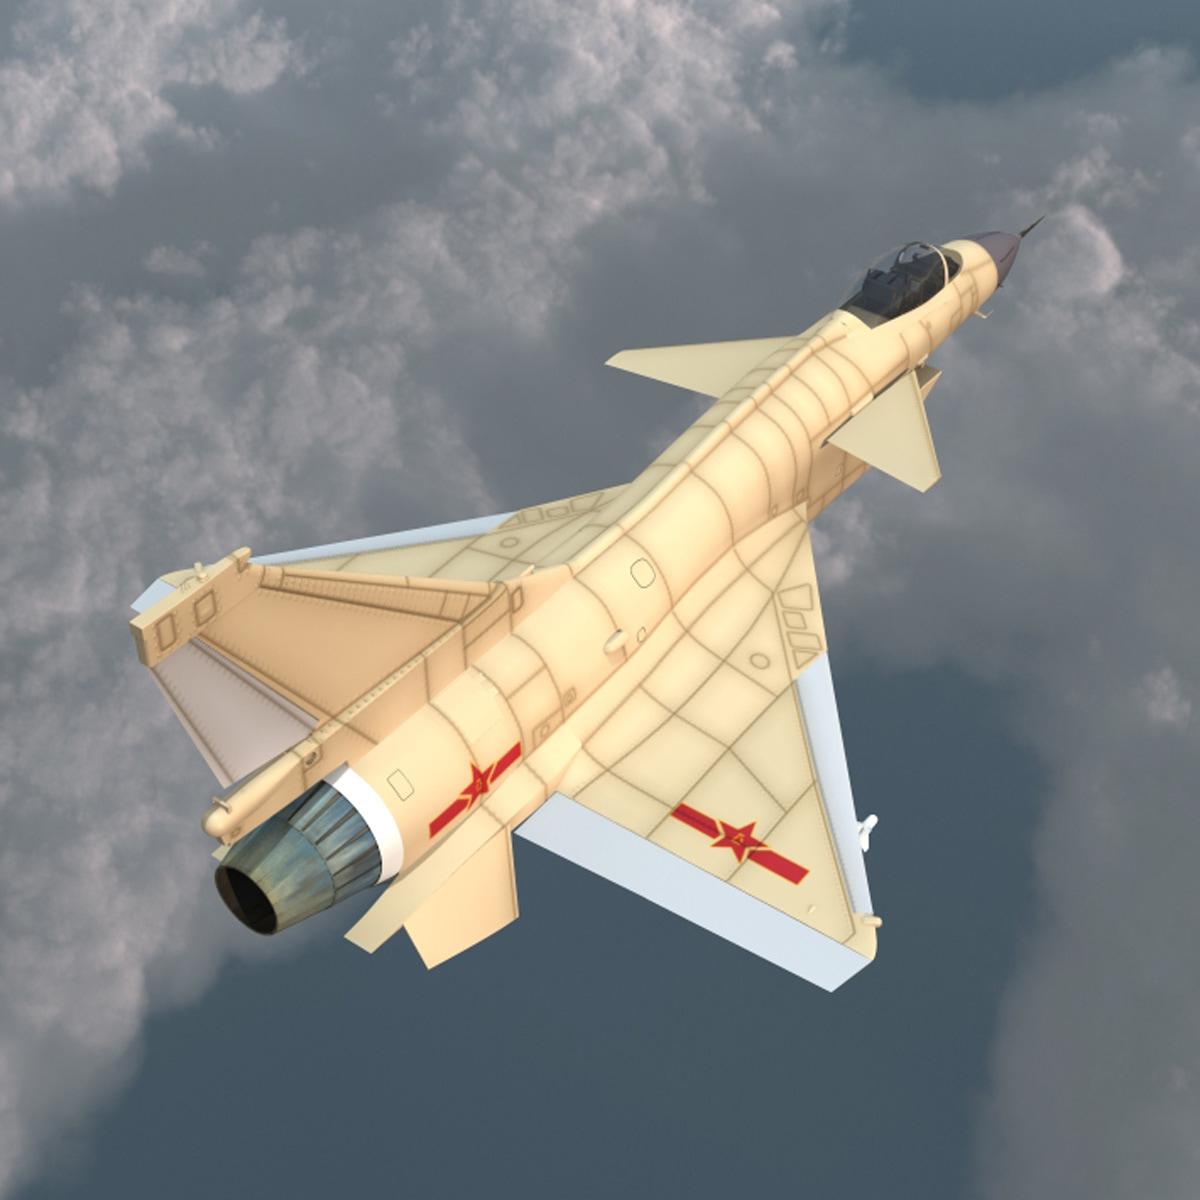 Chengdu J-10 China Fighter Aircraft Rigged